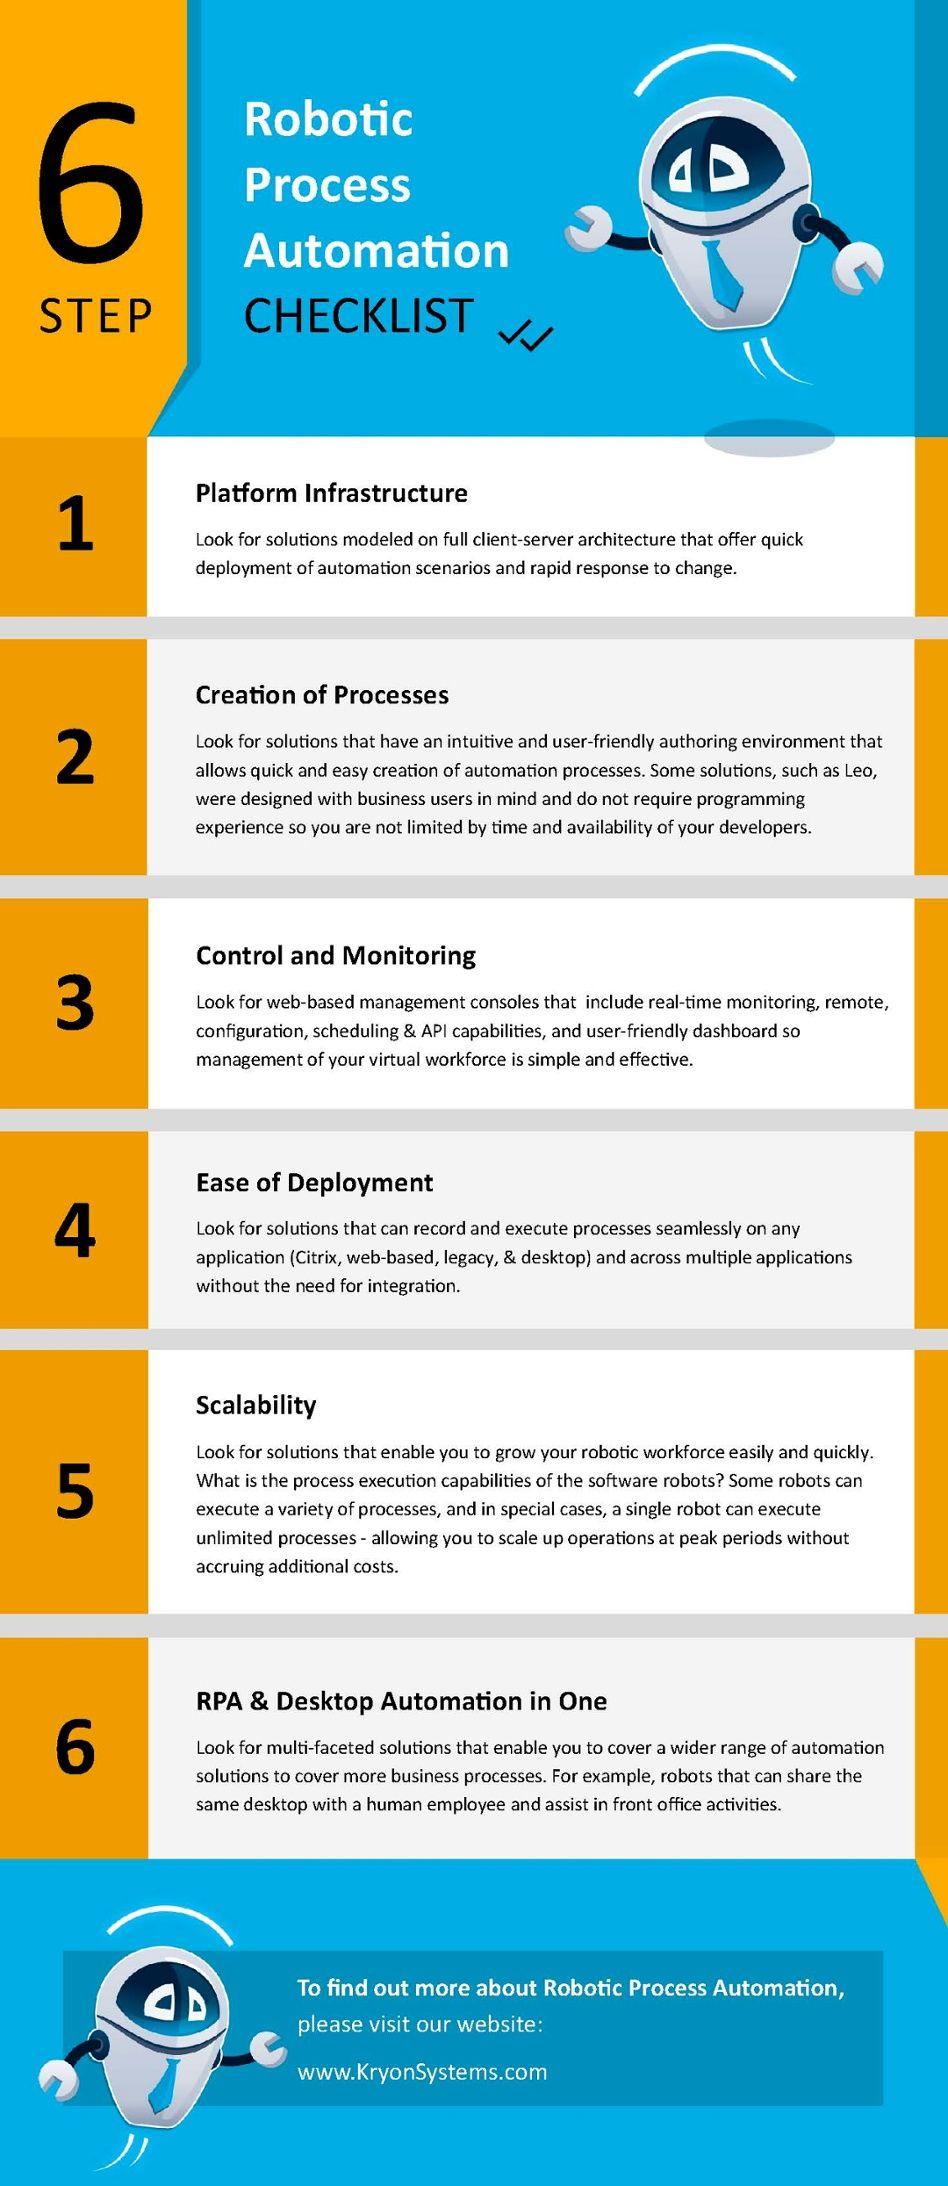 RPA Checklist Essential Criteria for Choosing the Best